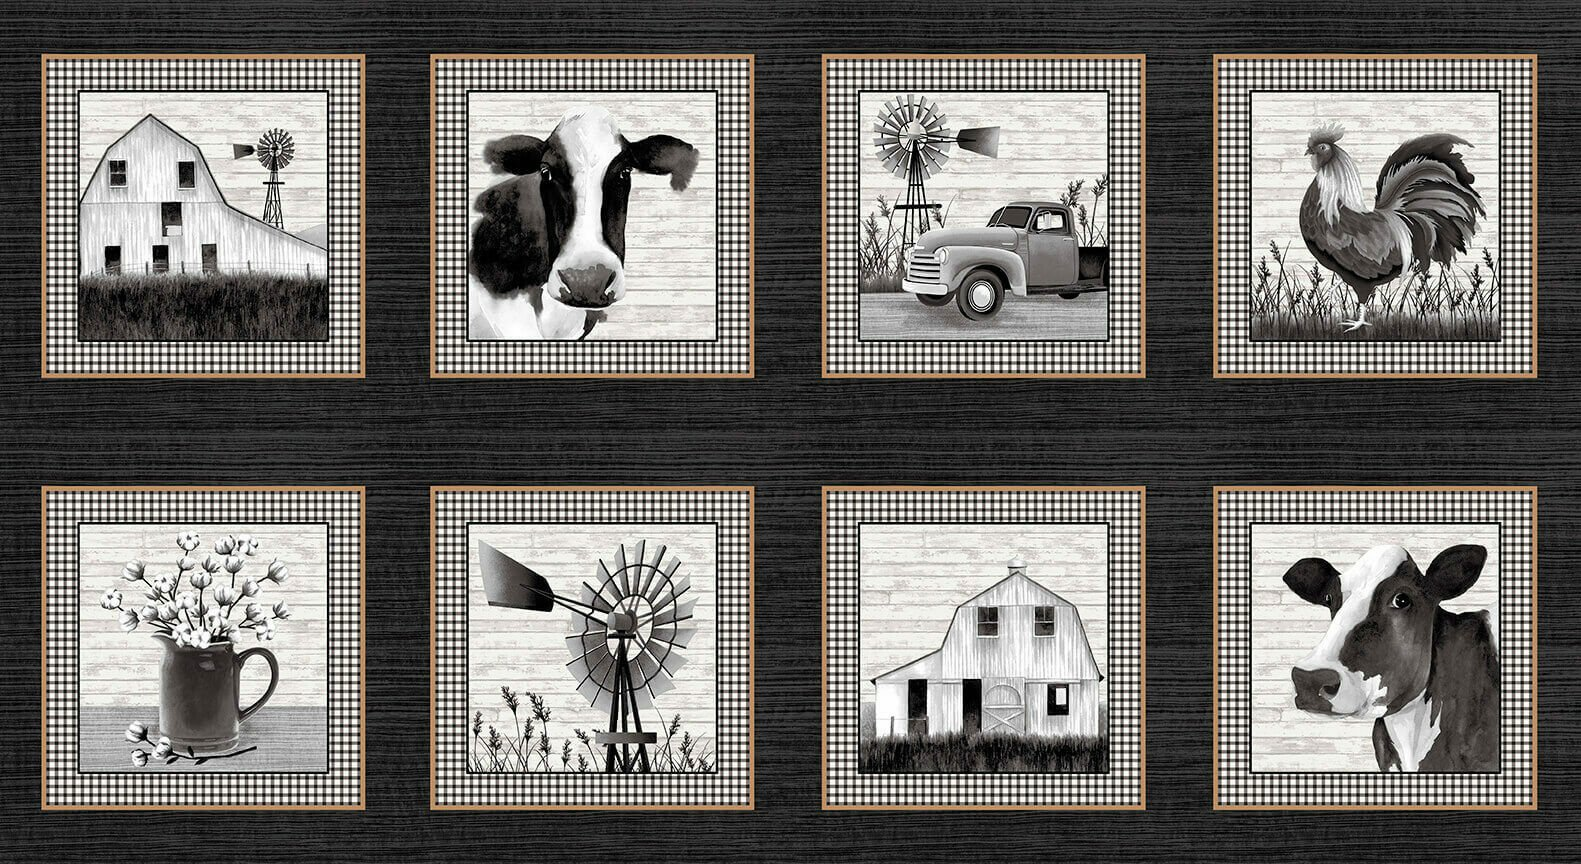 Buttermilk Farmstand Panel 9 Blocks